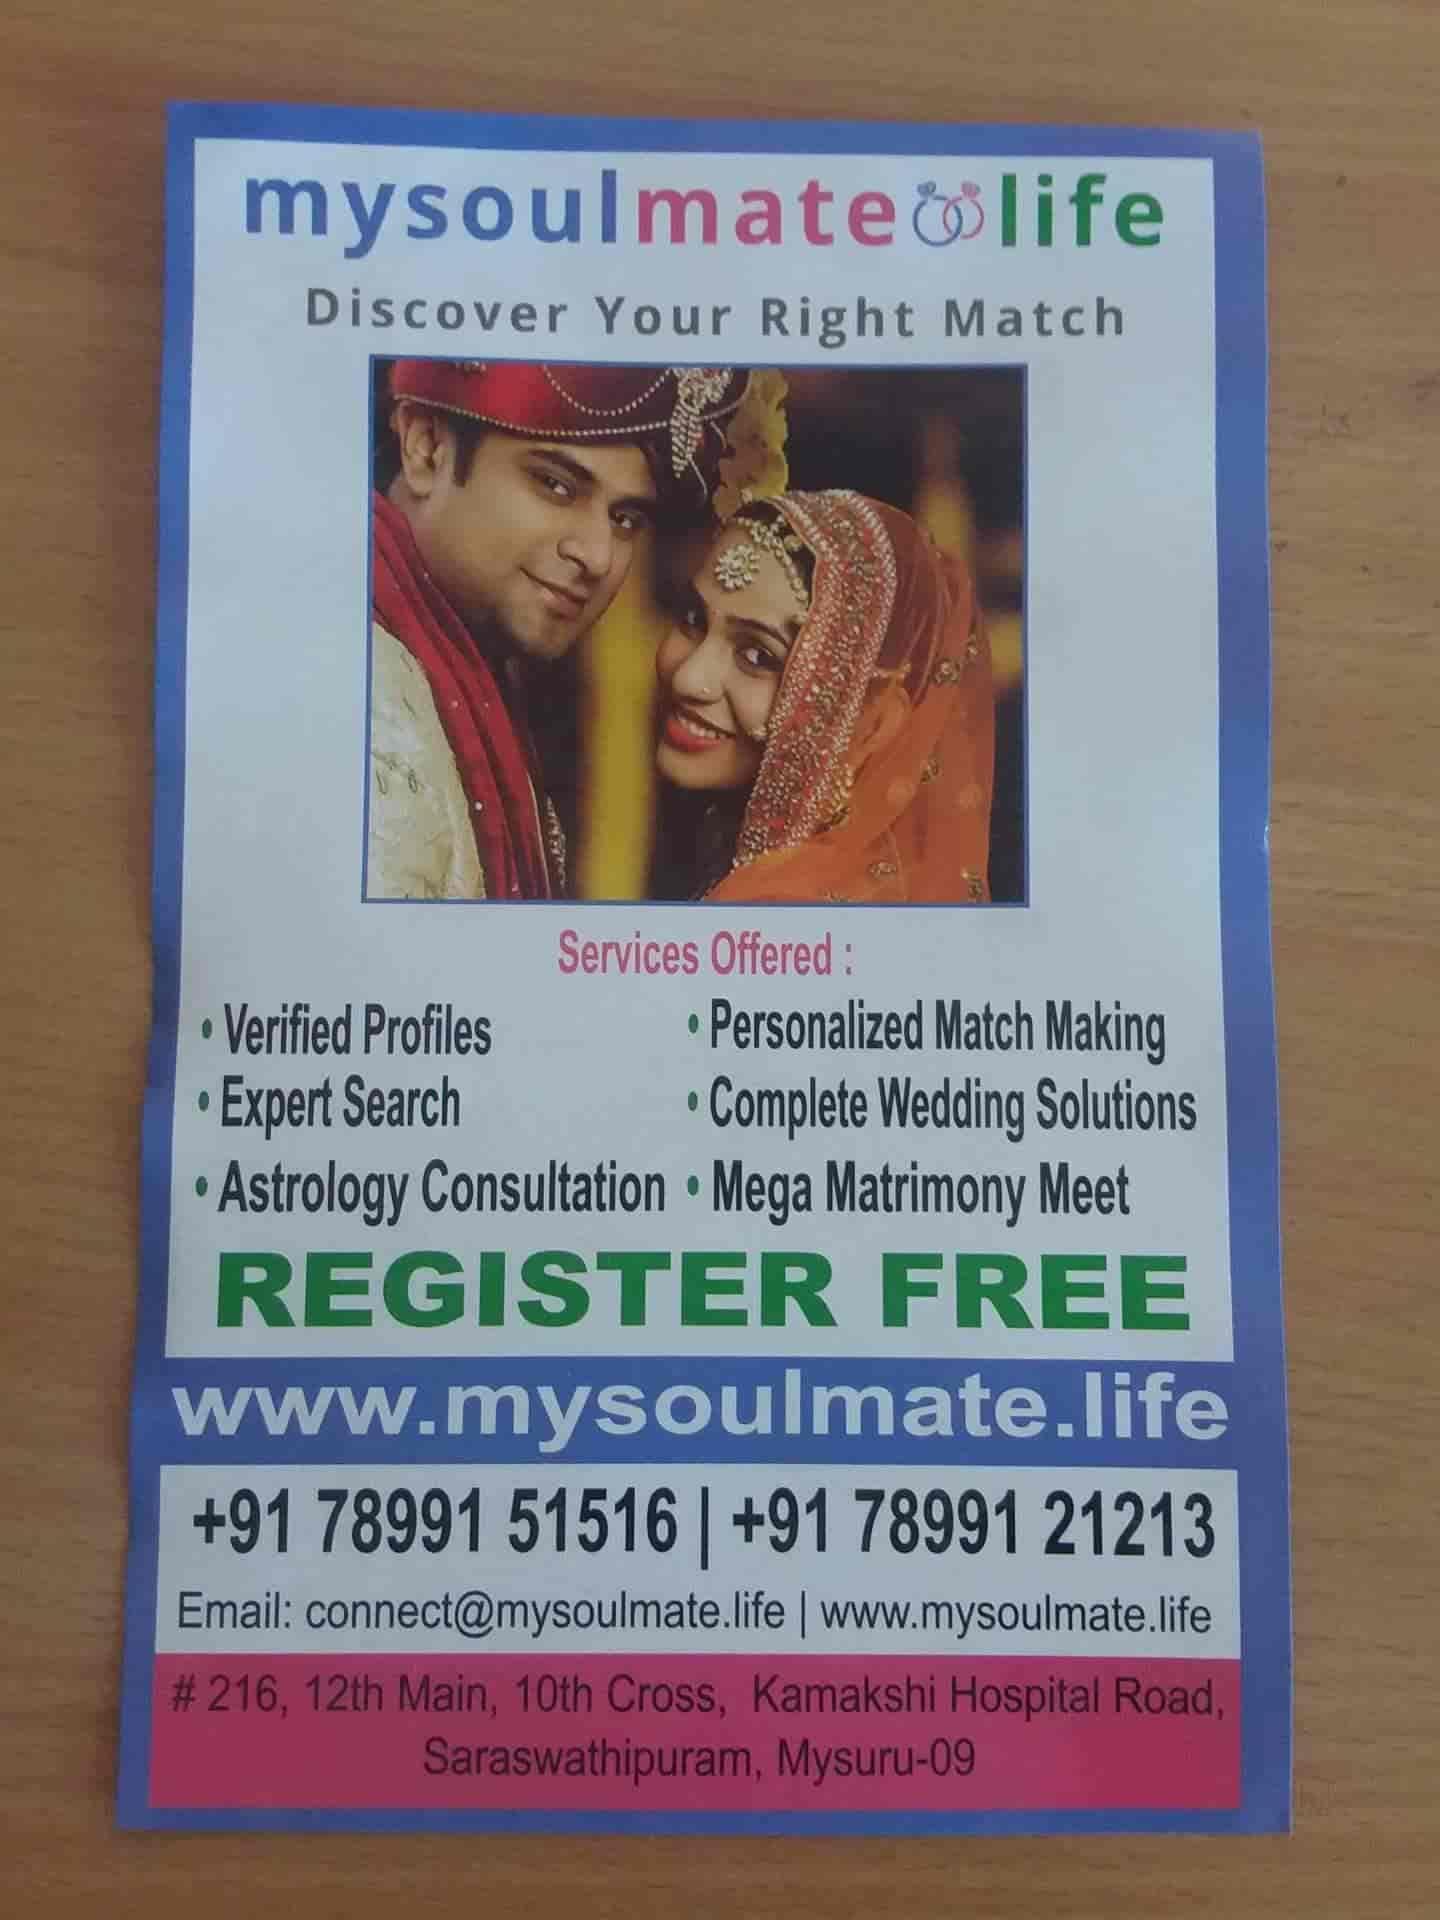 Mysoulmate life, TK Layout - Matrimonial Bureaus in Mysore - Justdial